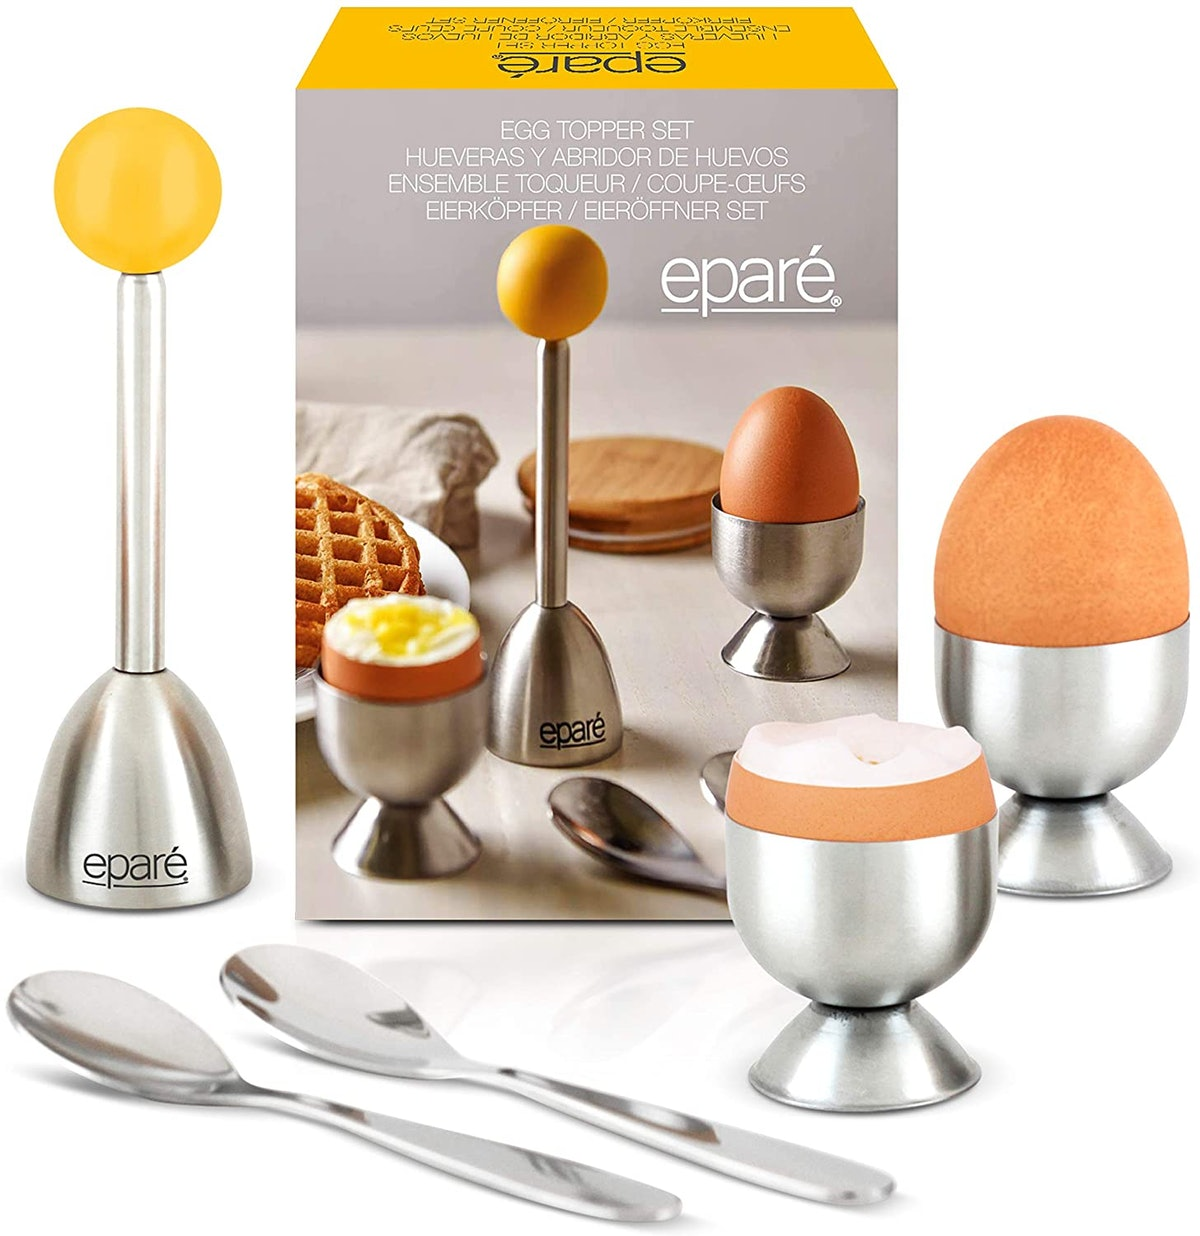 eparé Egg Cracker Topper Set (Set of 4)